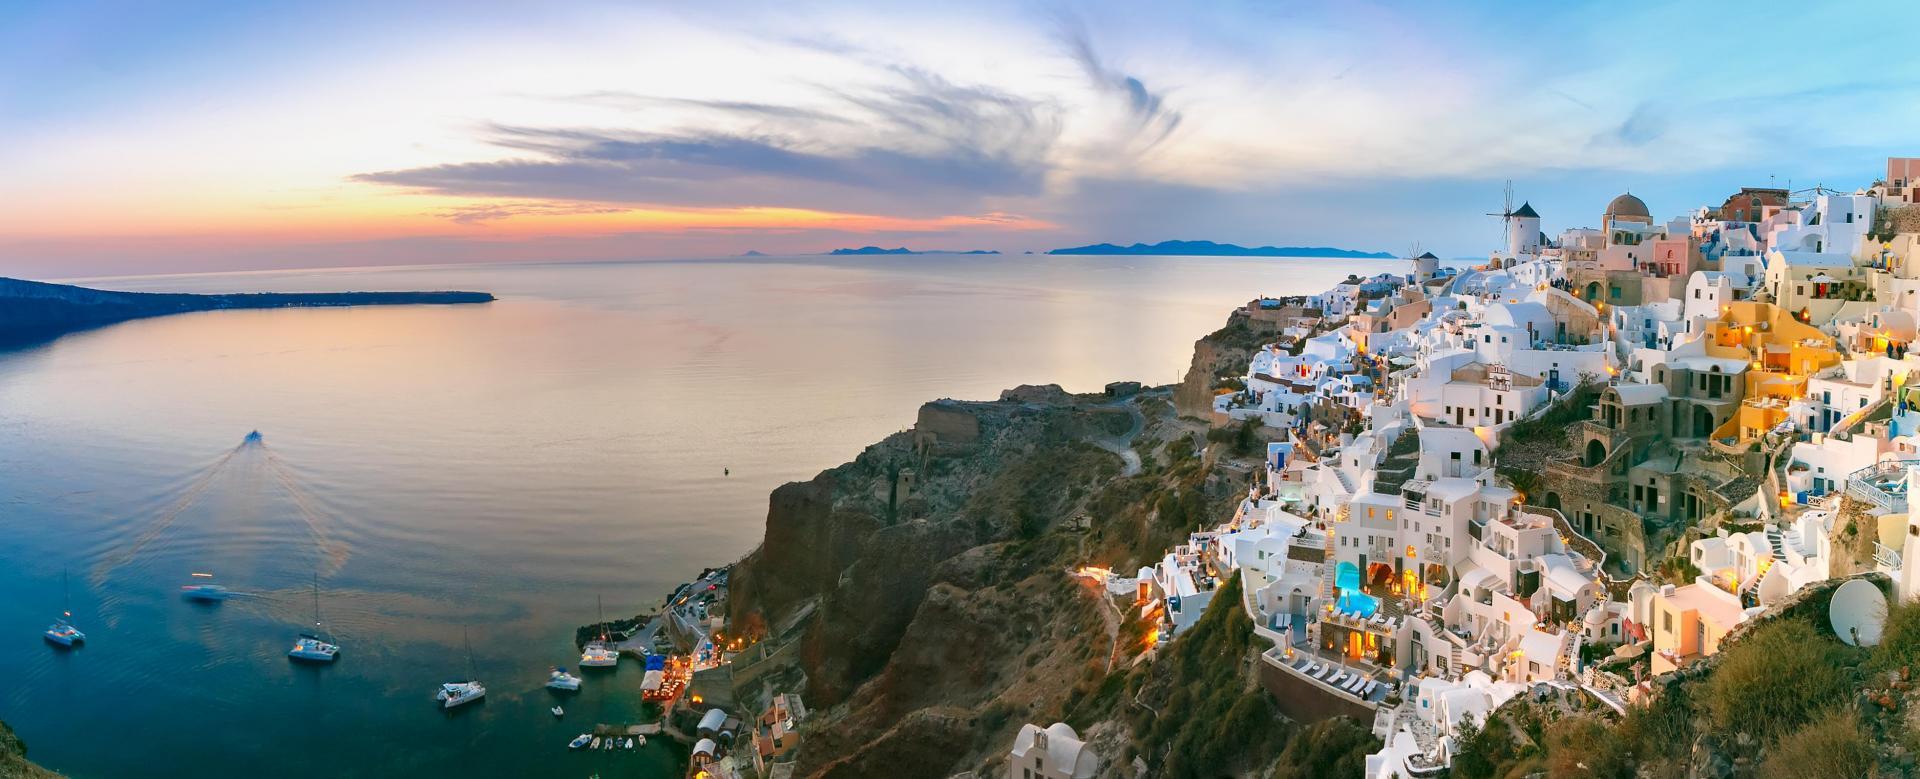 Voyage à pied Grèce : Santorin et sikinos